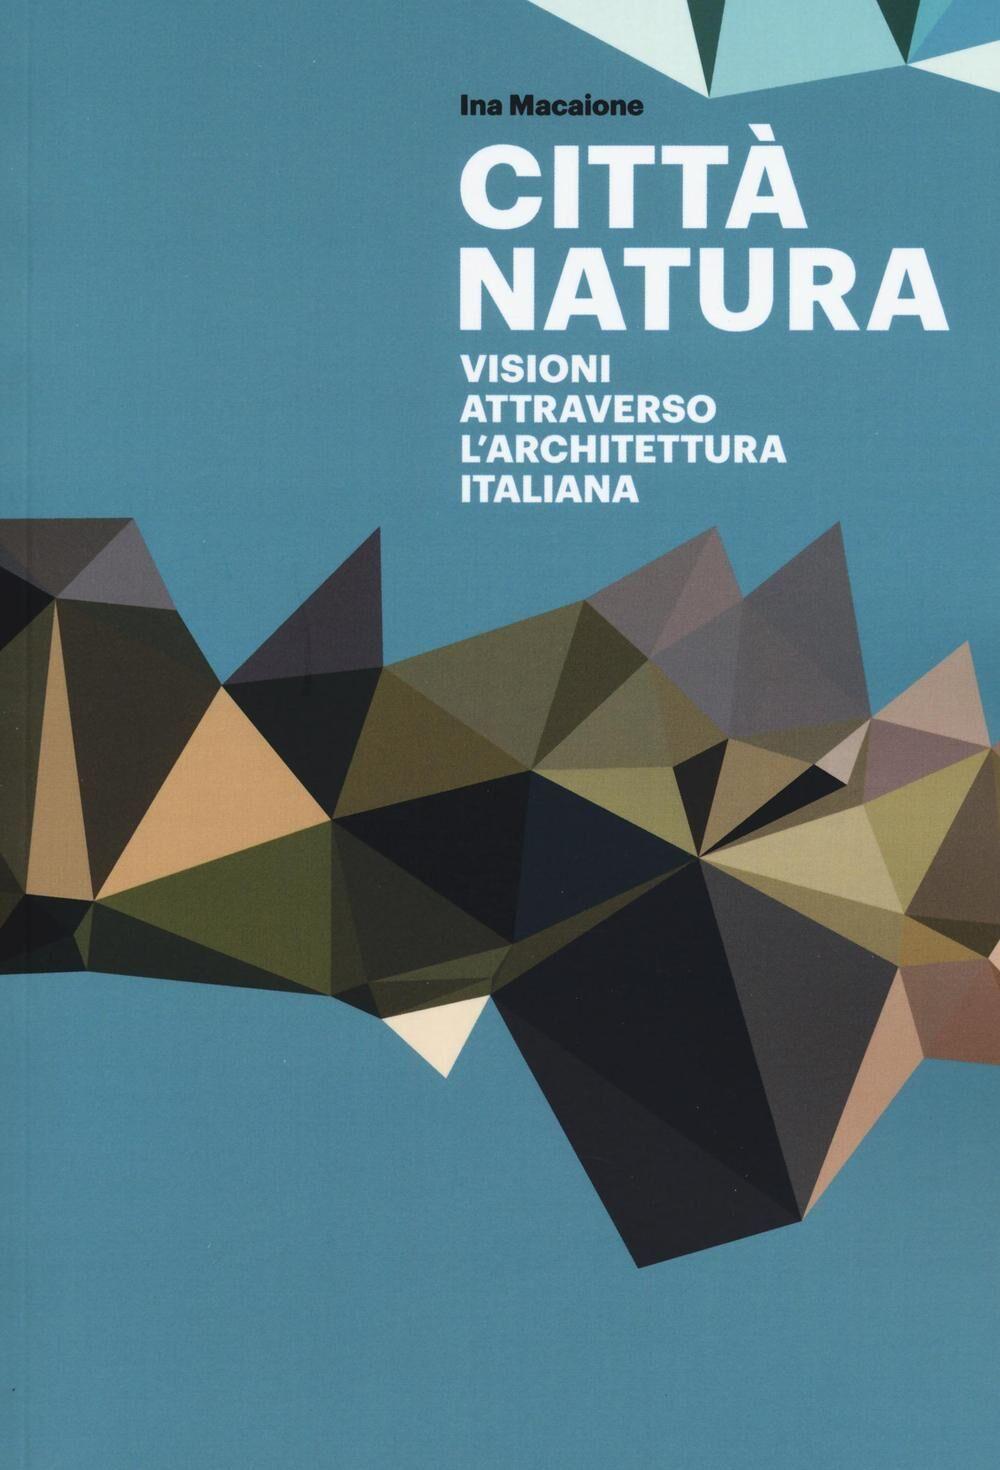 Città natura. Visioni attraverso l'architettura italiana